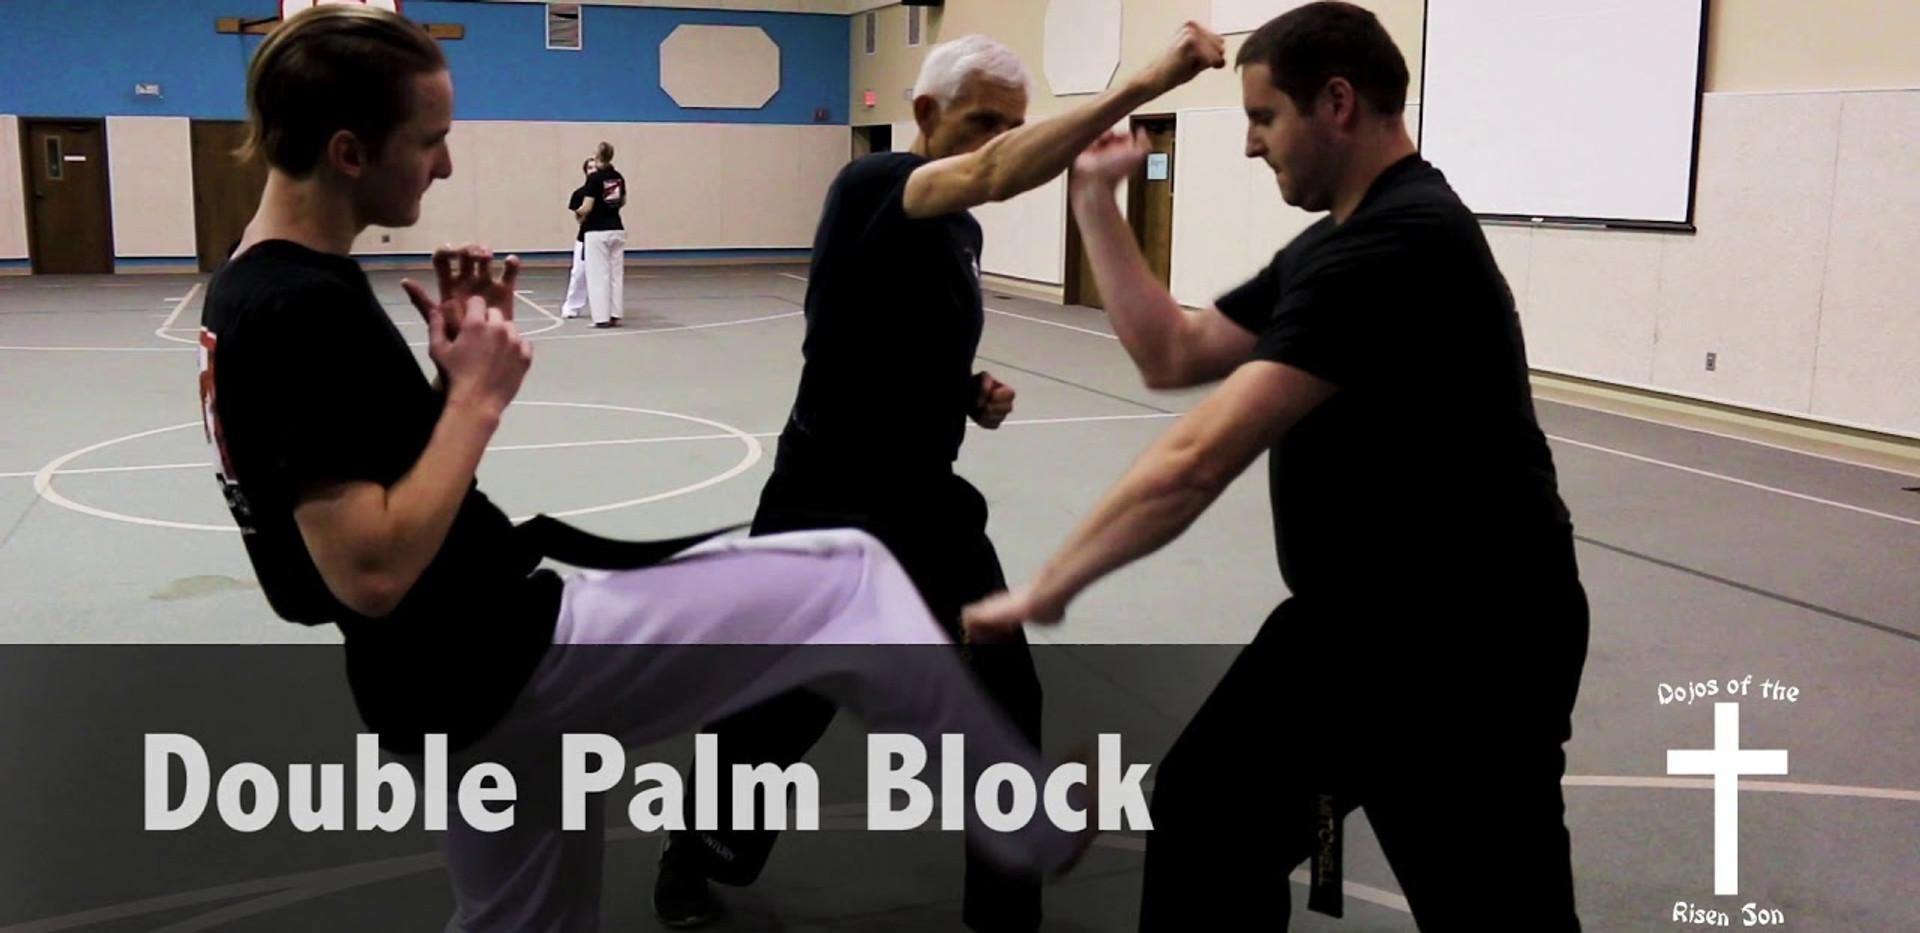 Double Palm Block